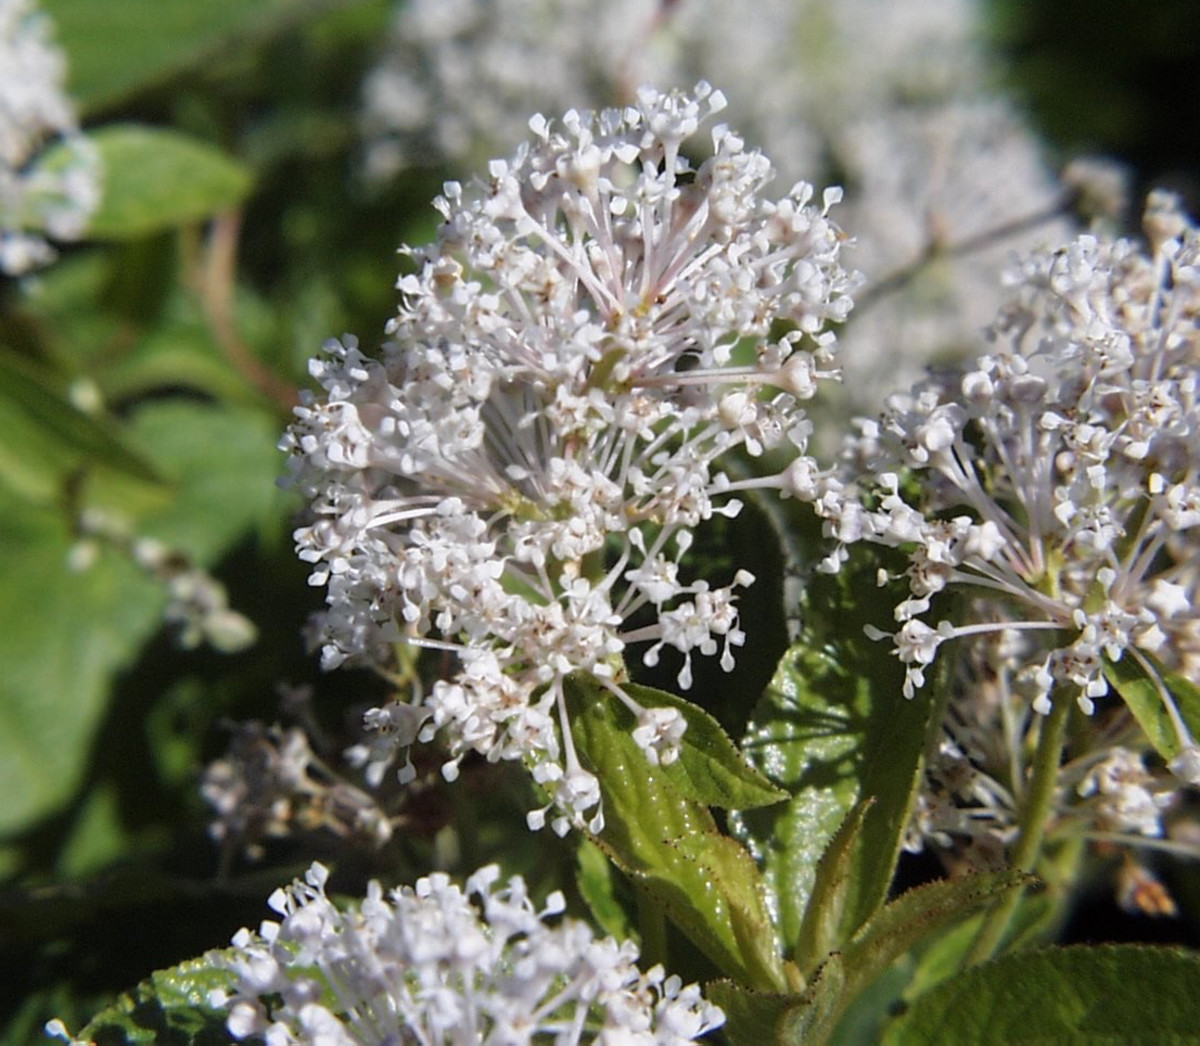 How to Grow Ceanothus (California Lilac) | Dengarden